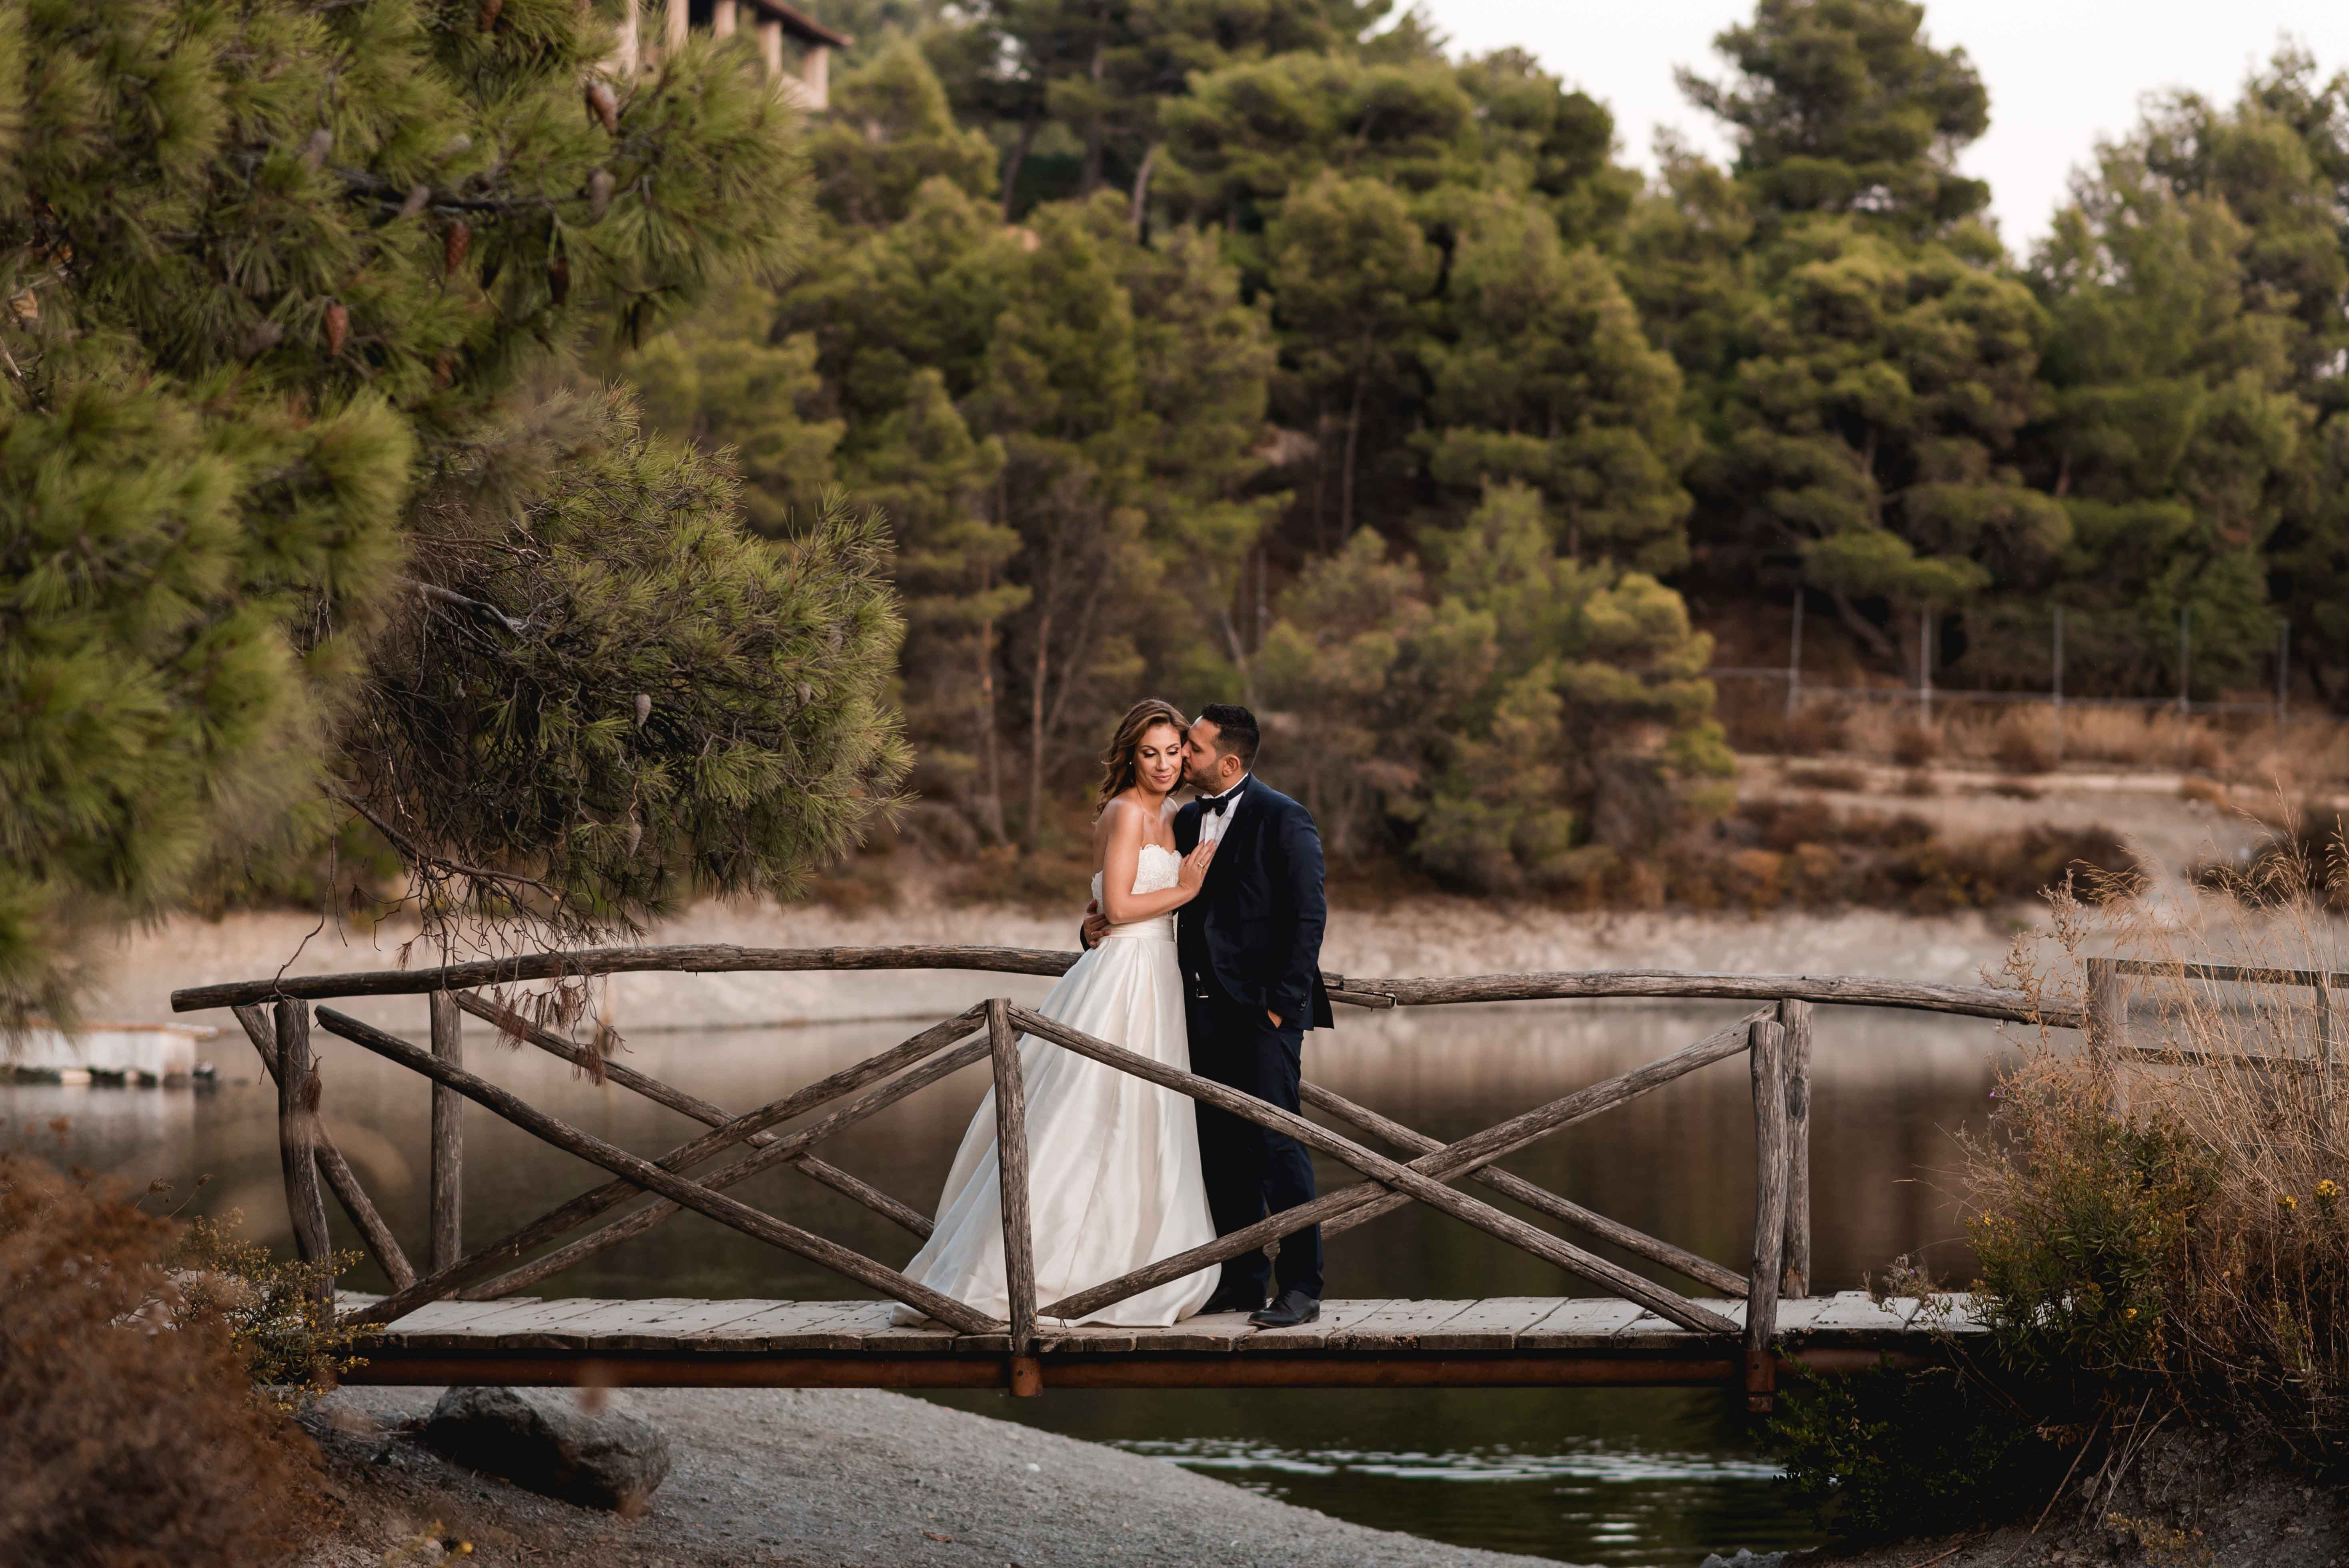 Wedding photography Fotografos gamou Next day